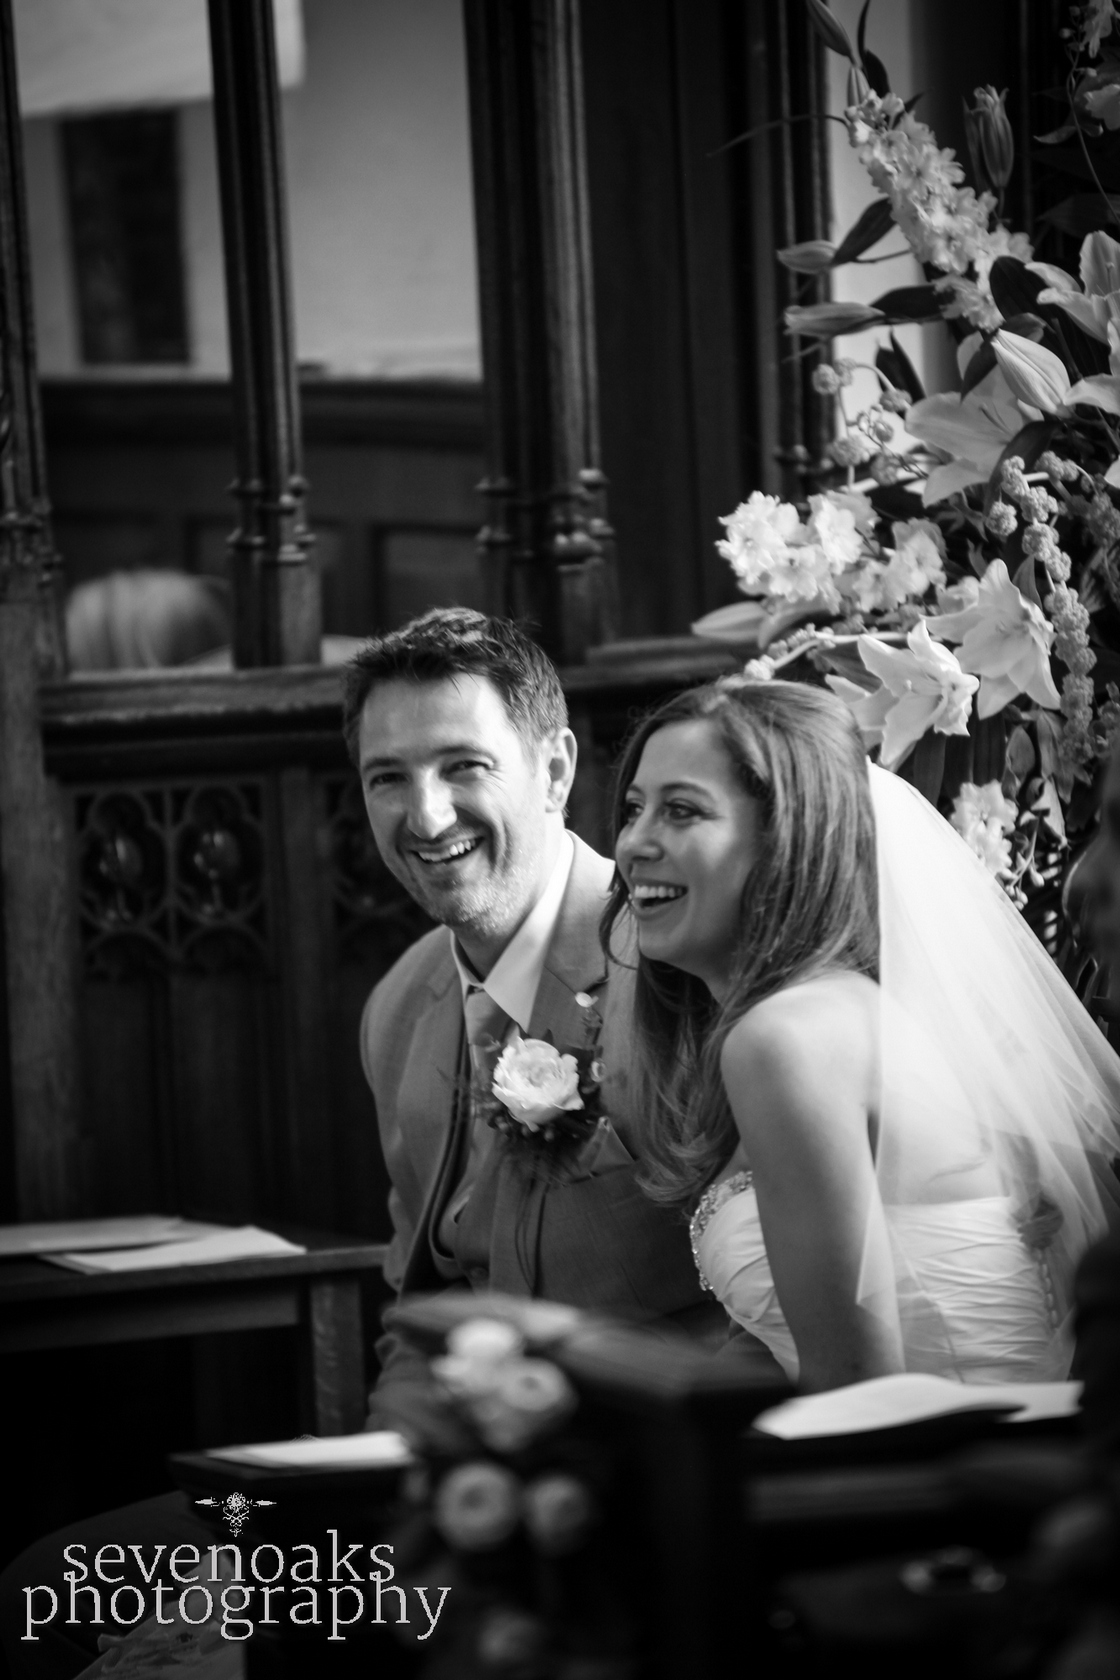 Sevenoaks documentary wedding photographer-97.jpg